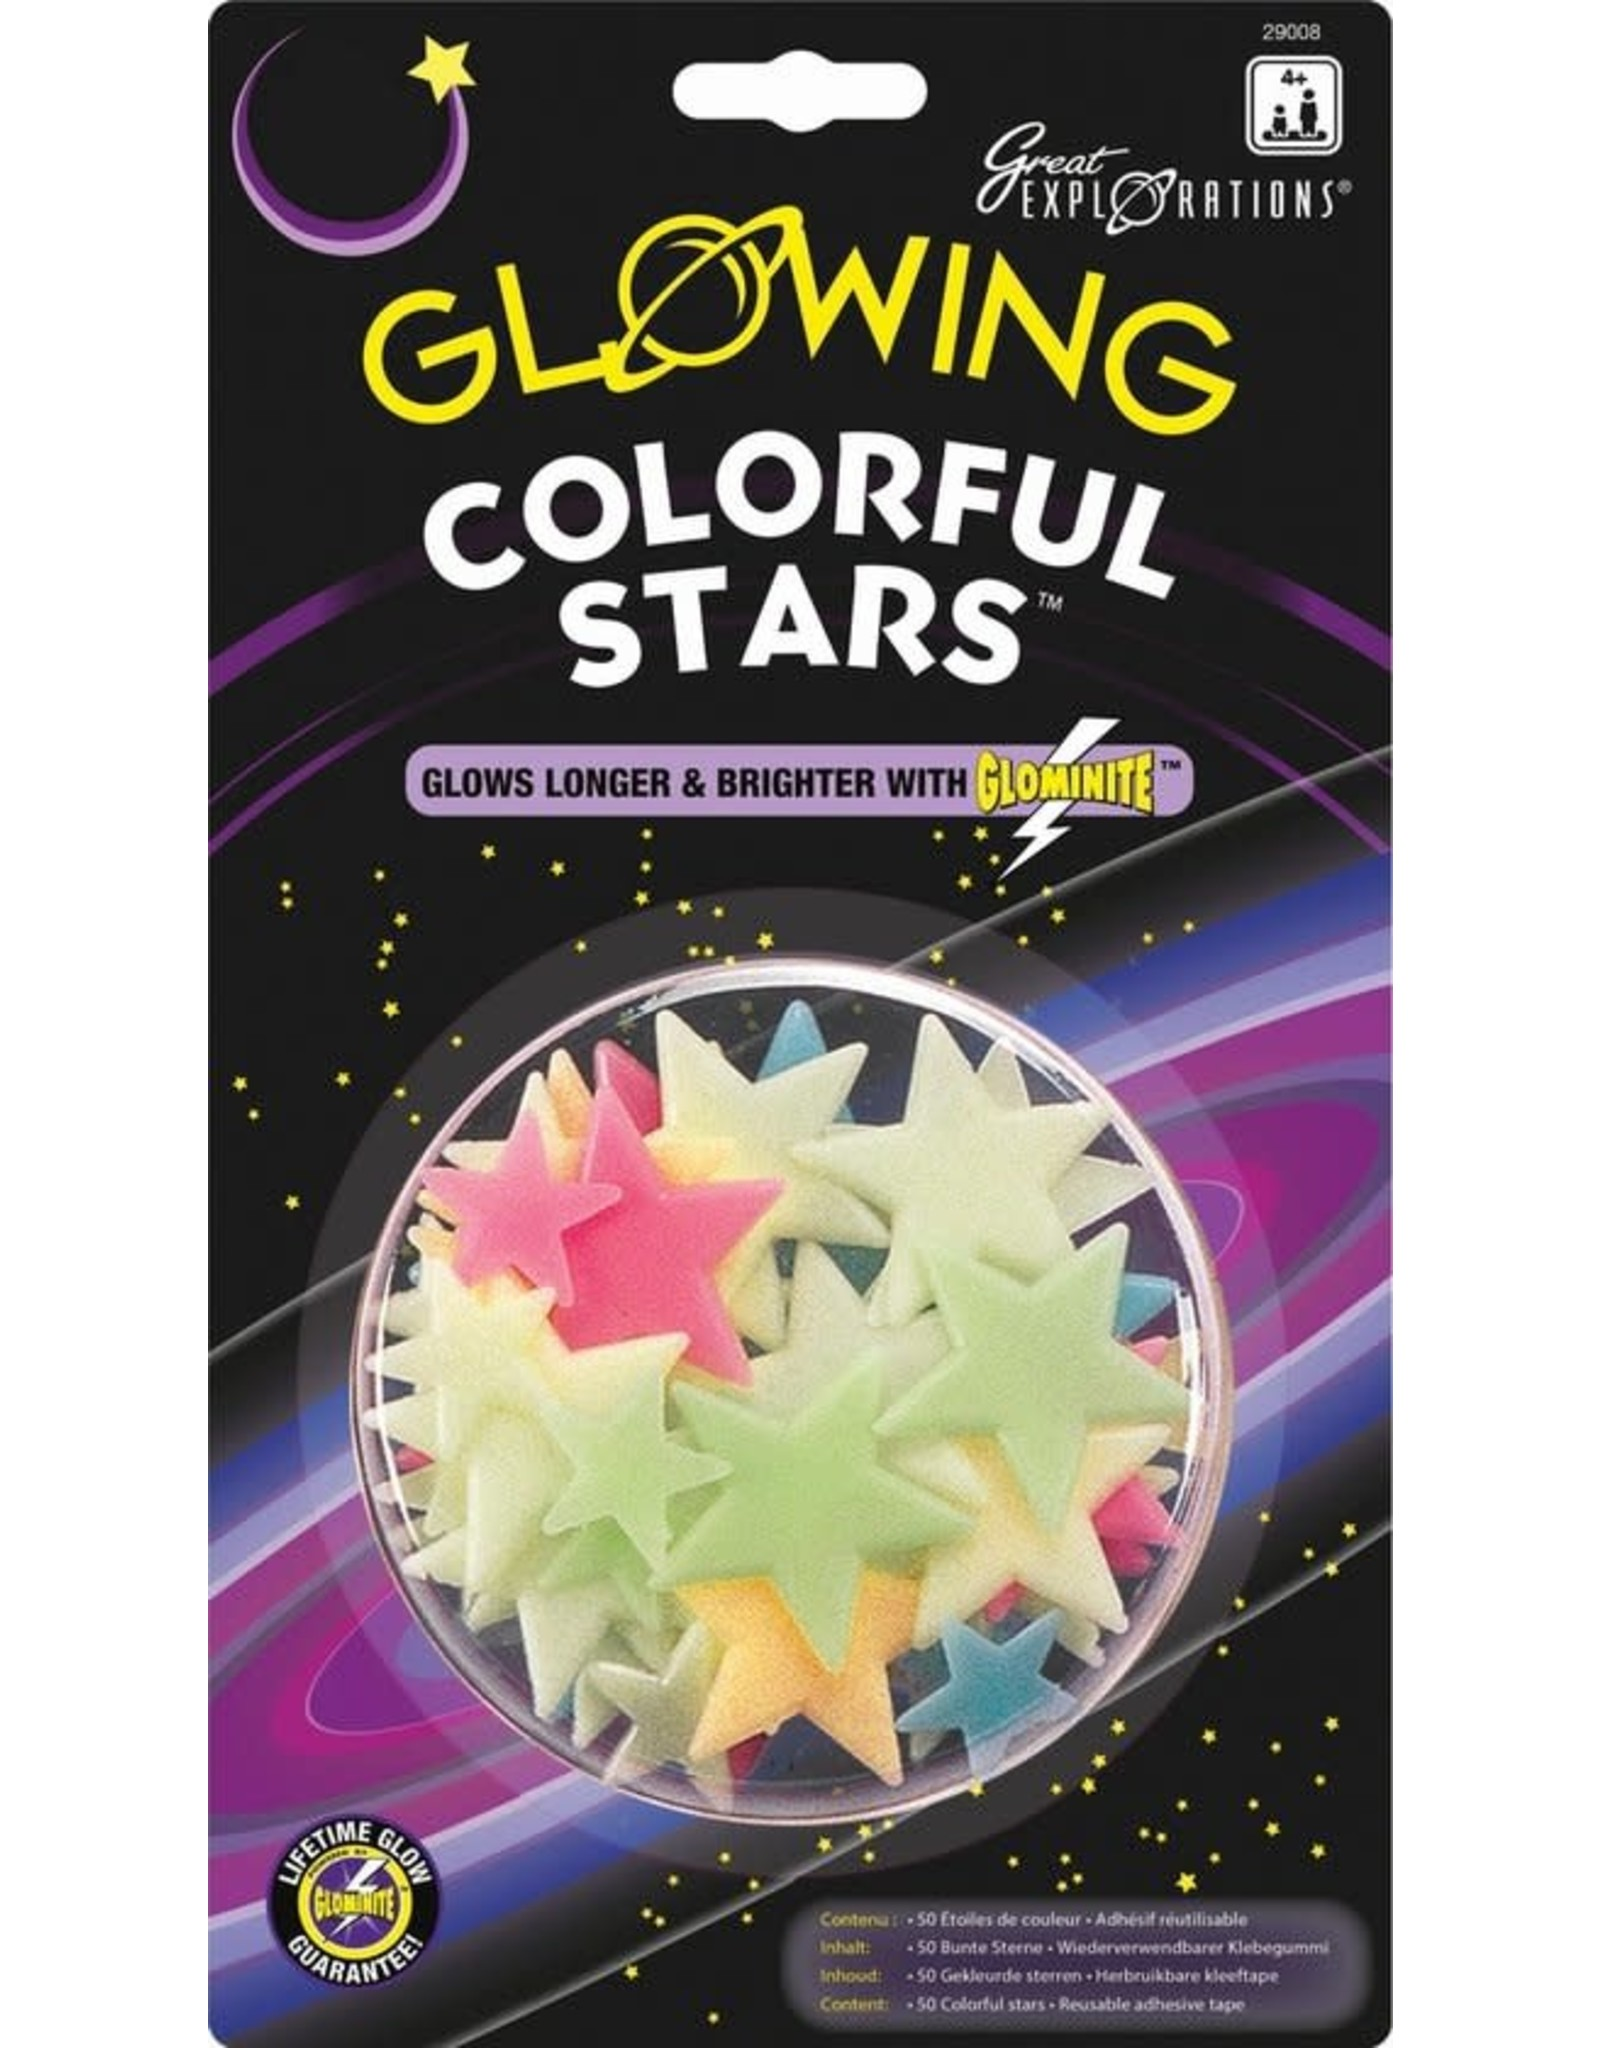 Glow in the Dark Sterren Colorful Stars